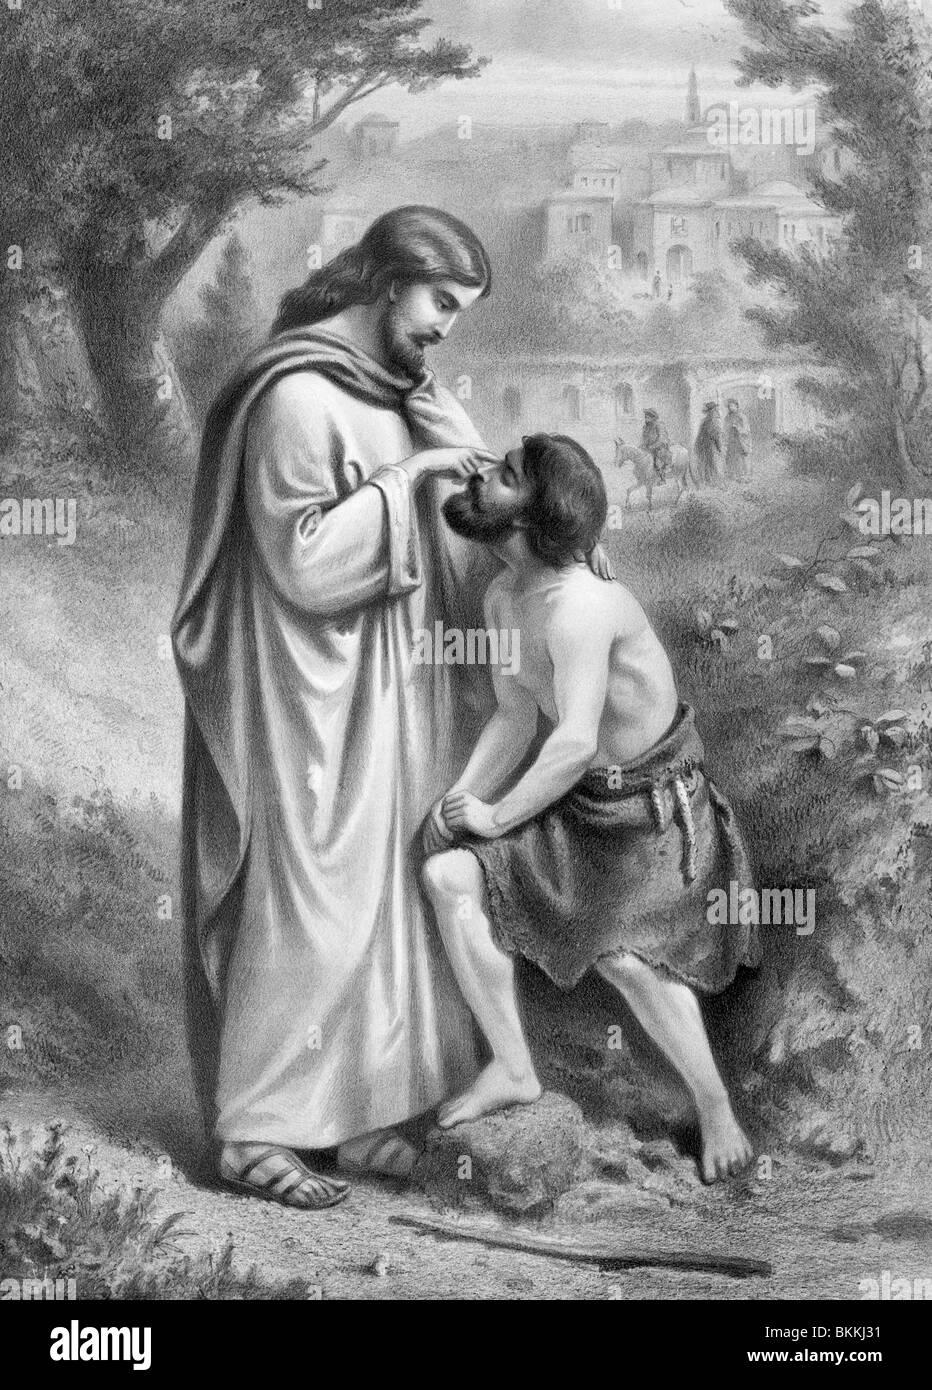 jesus christ performing one of his miracles walking on lake